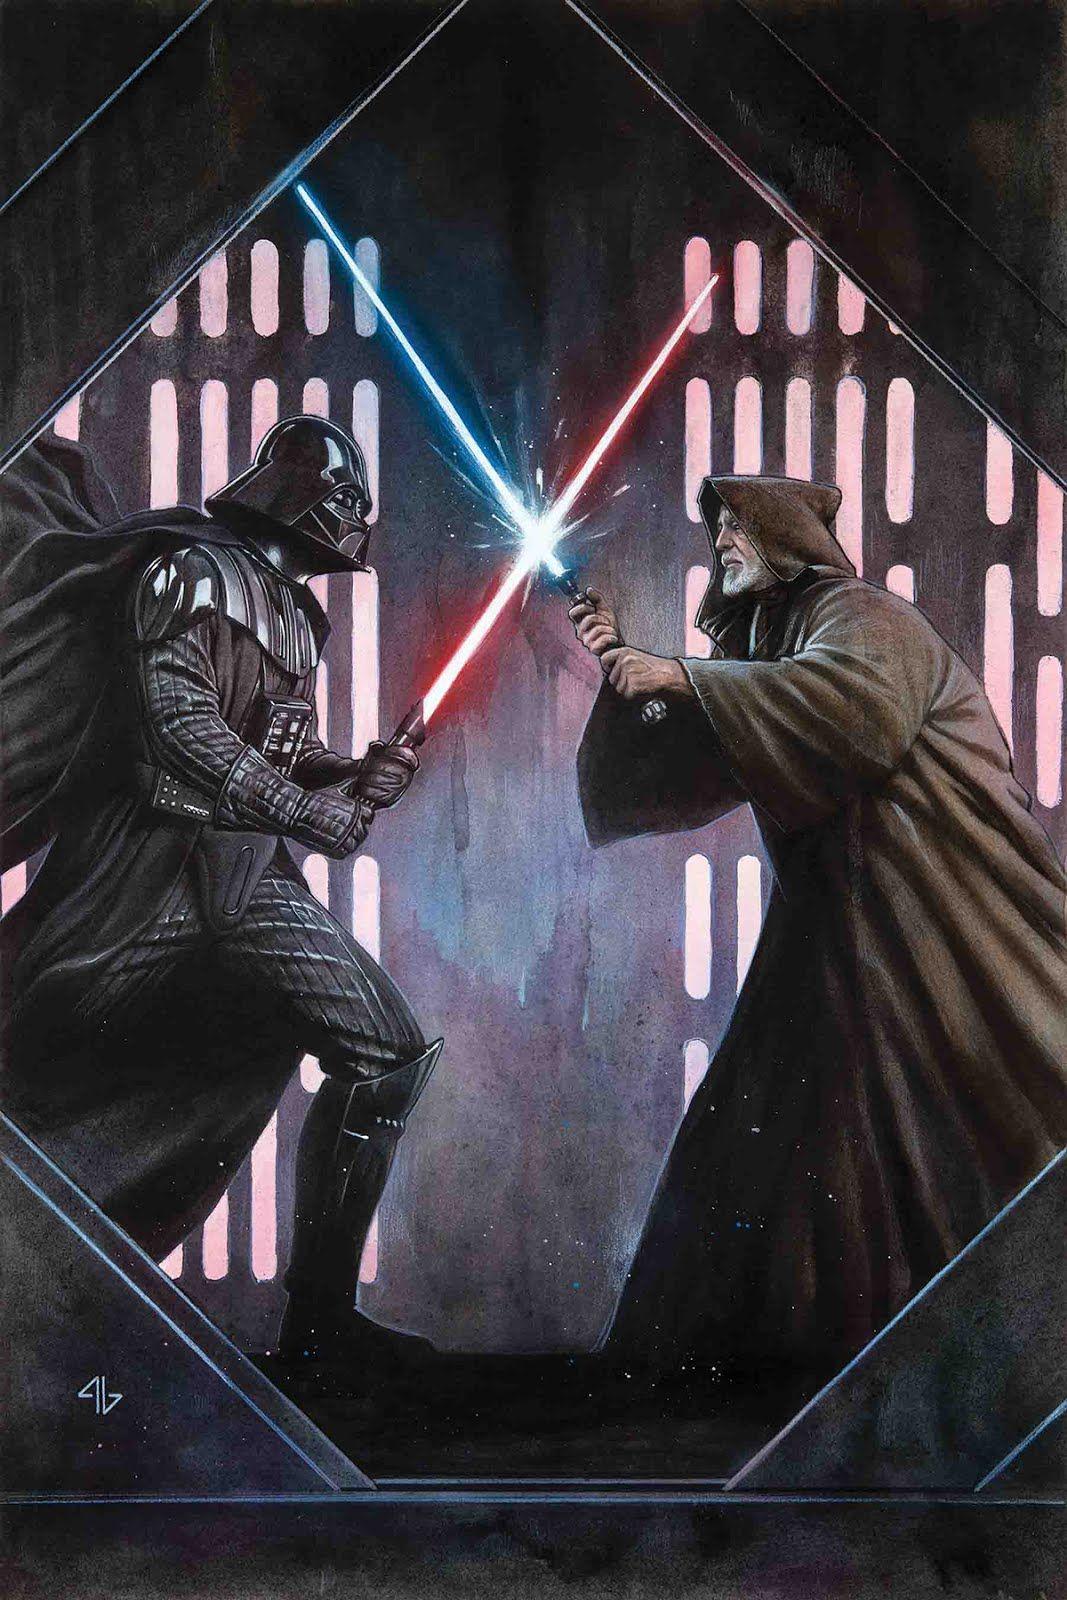 Star Wars Jedi Republic Mace Windu 2 By Adi Granov Star Wars Comics Star Wars Poster Star Wars Wallpaper